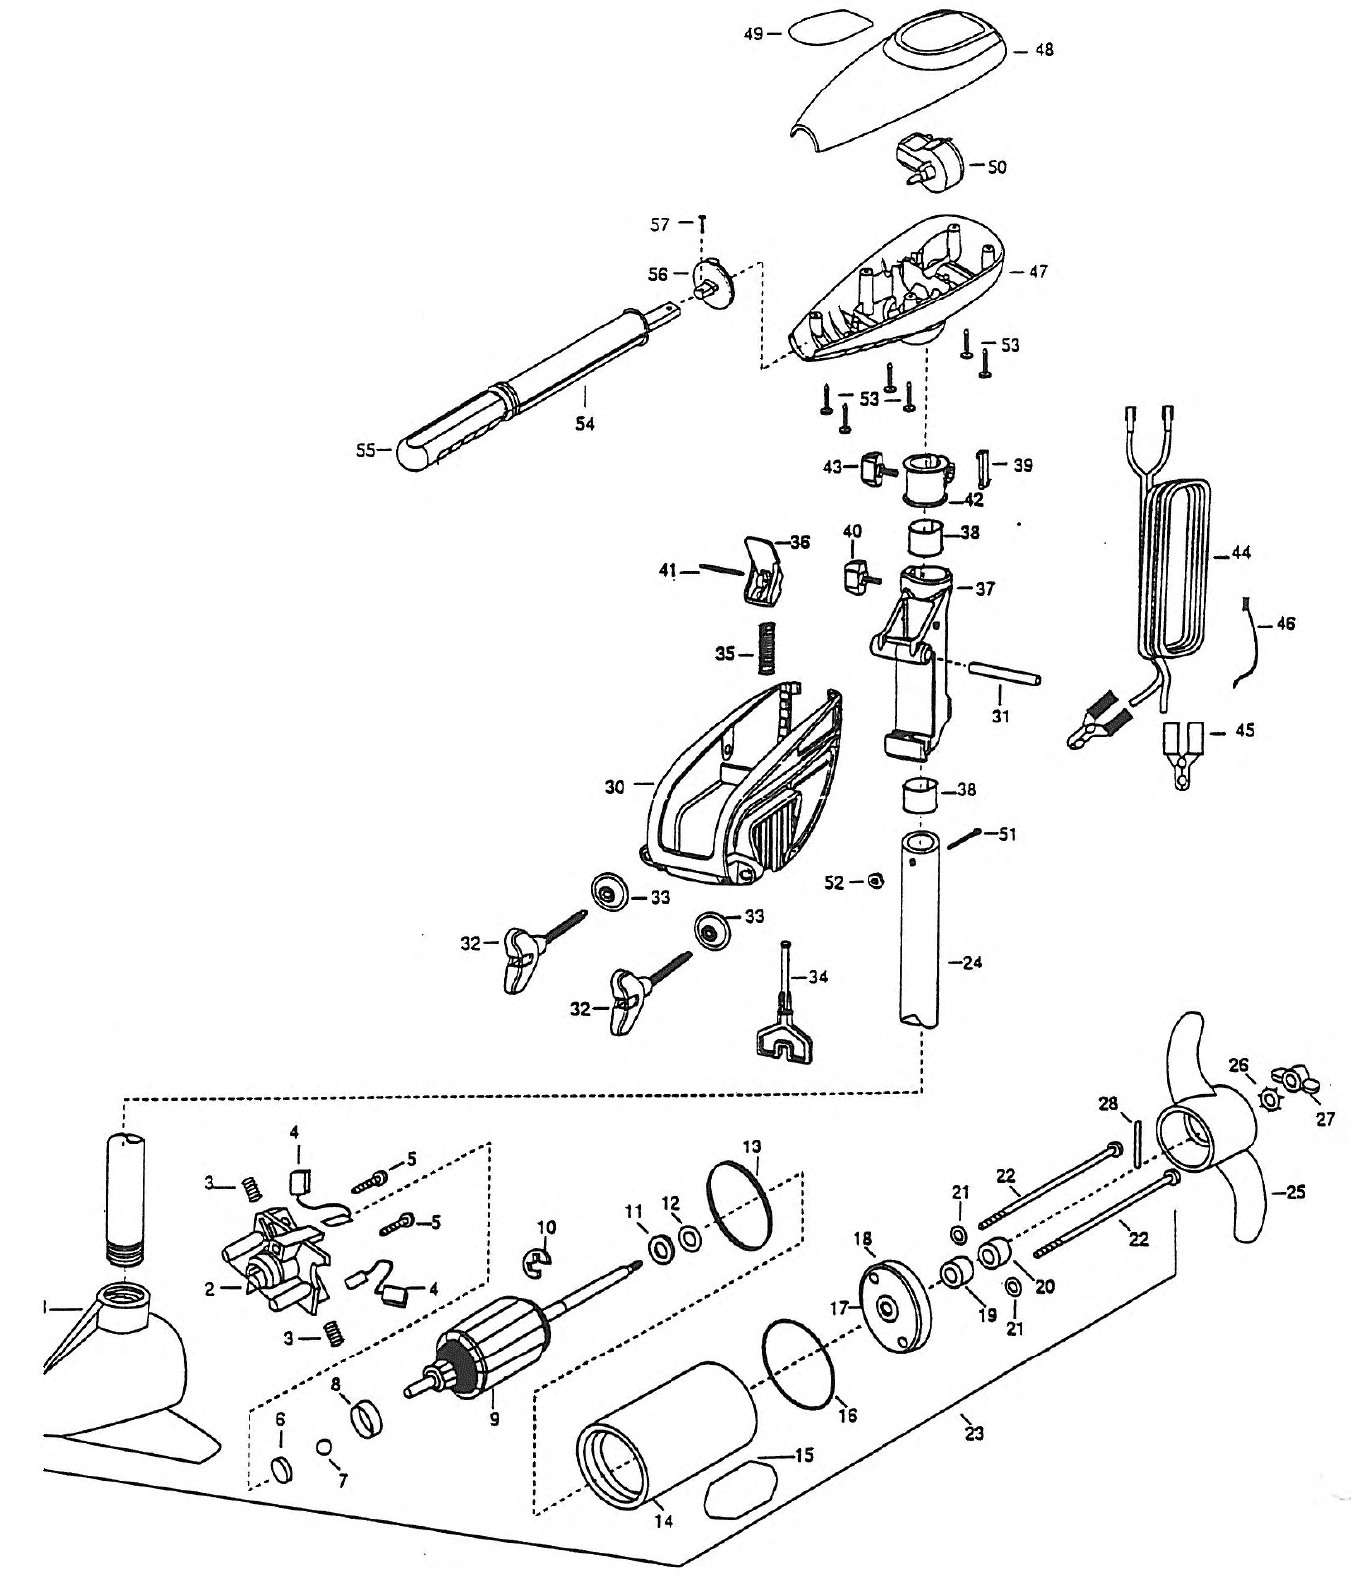 minn kota endura 36 parts 1998 from. Black Bedroom Furniture Sets. Home Design Ideas